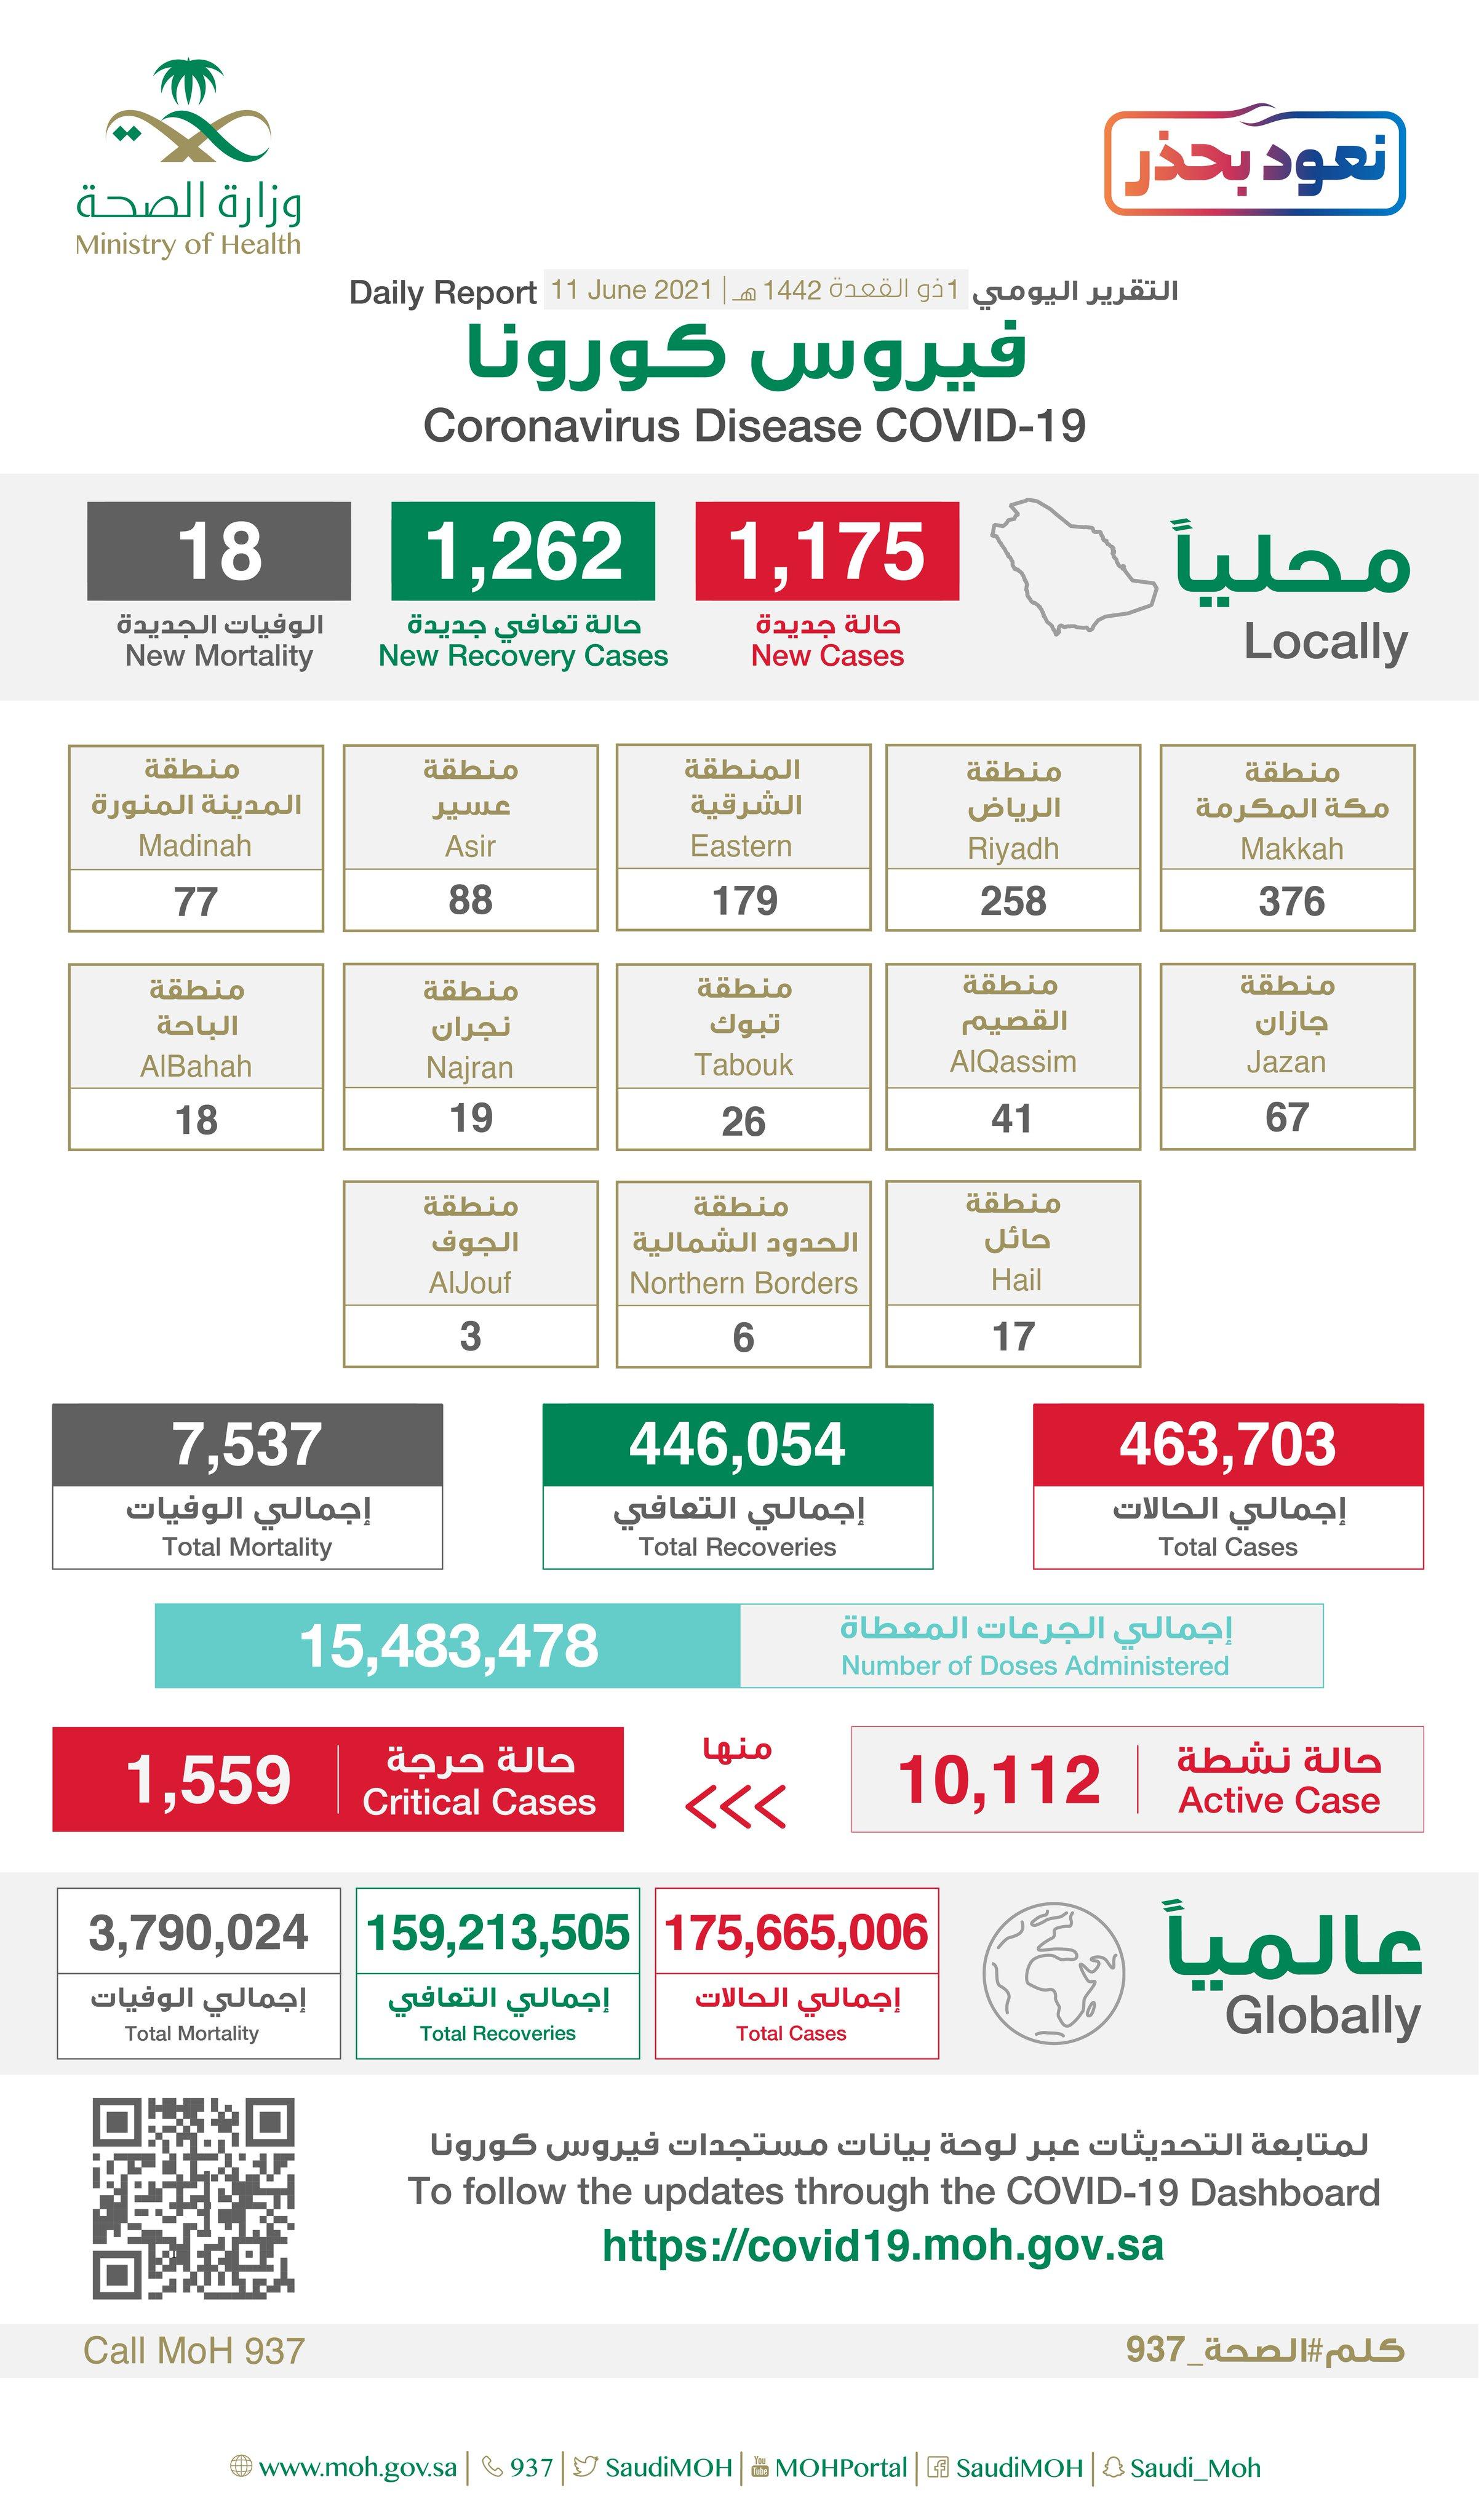 Saudi Arabia Coronavirus : Total Cases :463,703 , New Cases : 1,175 , Cured : 446,054 , Deaths: 7,537, Active Cases : 10,112